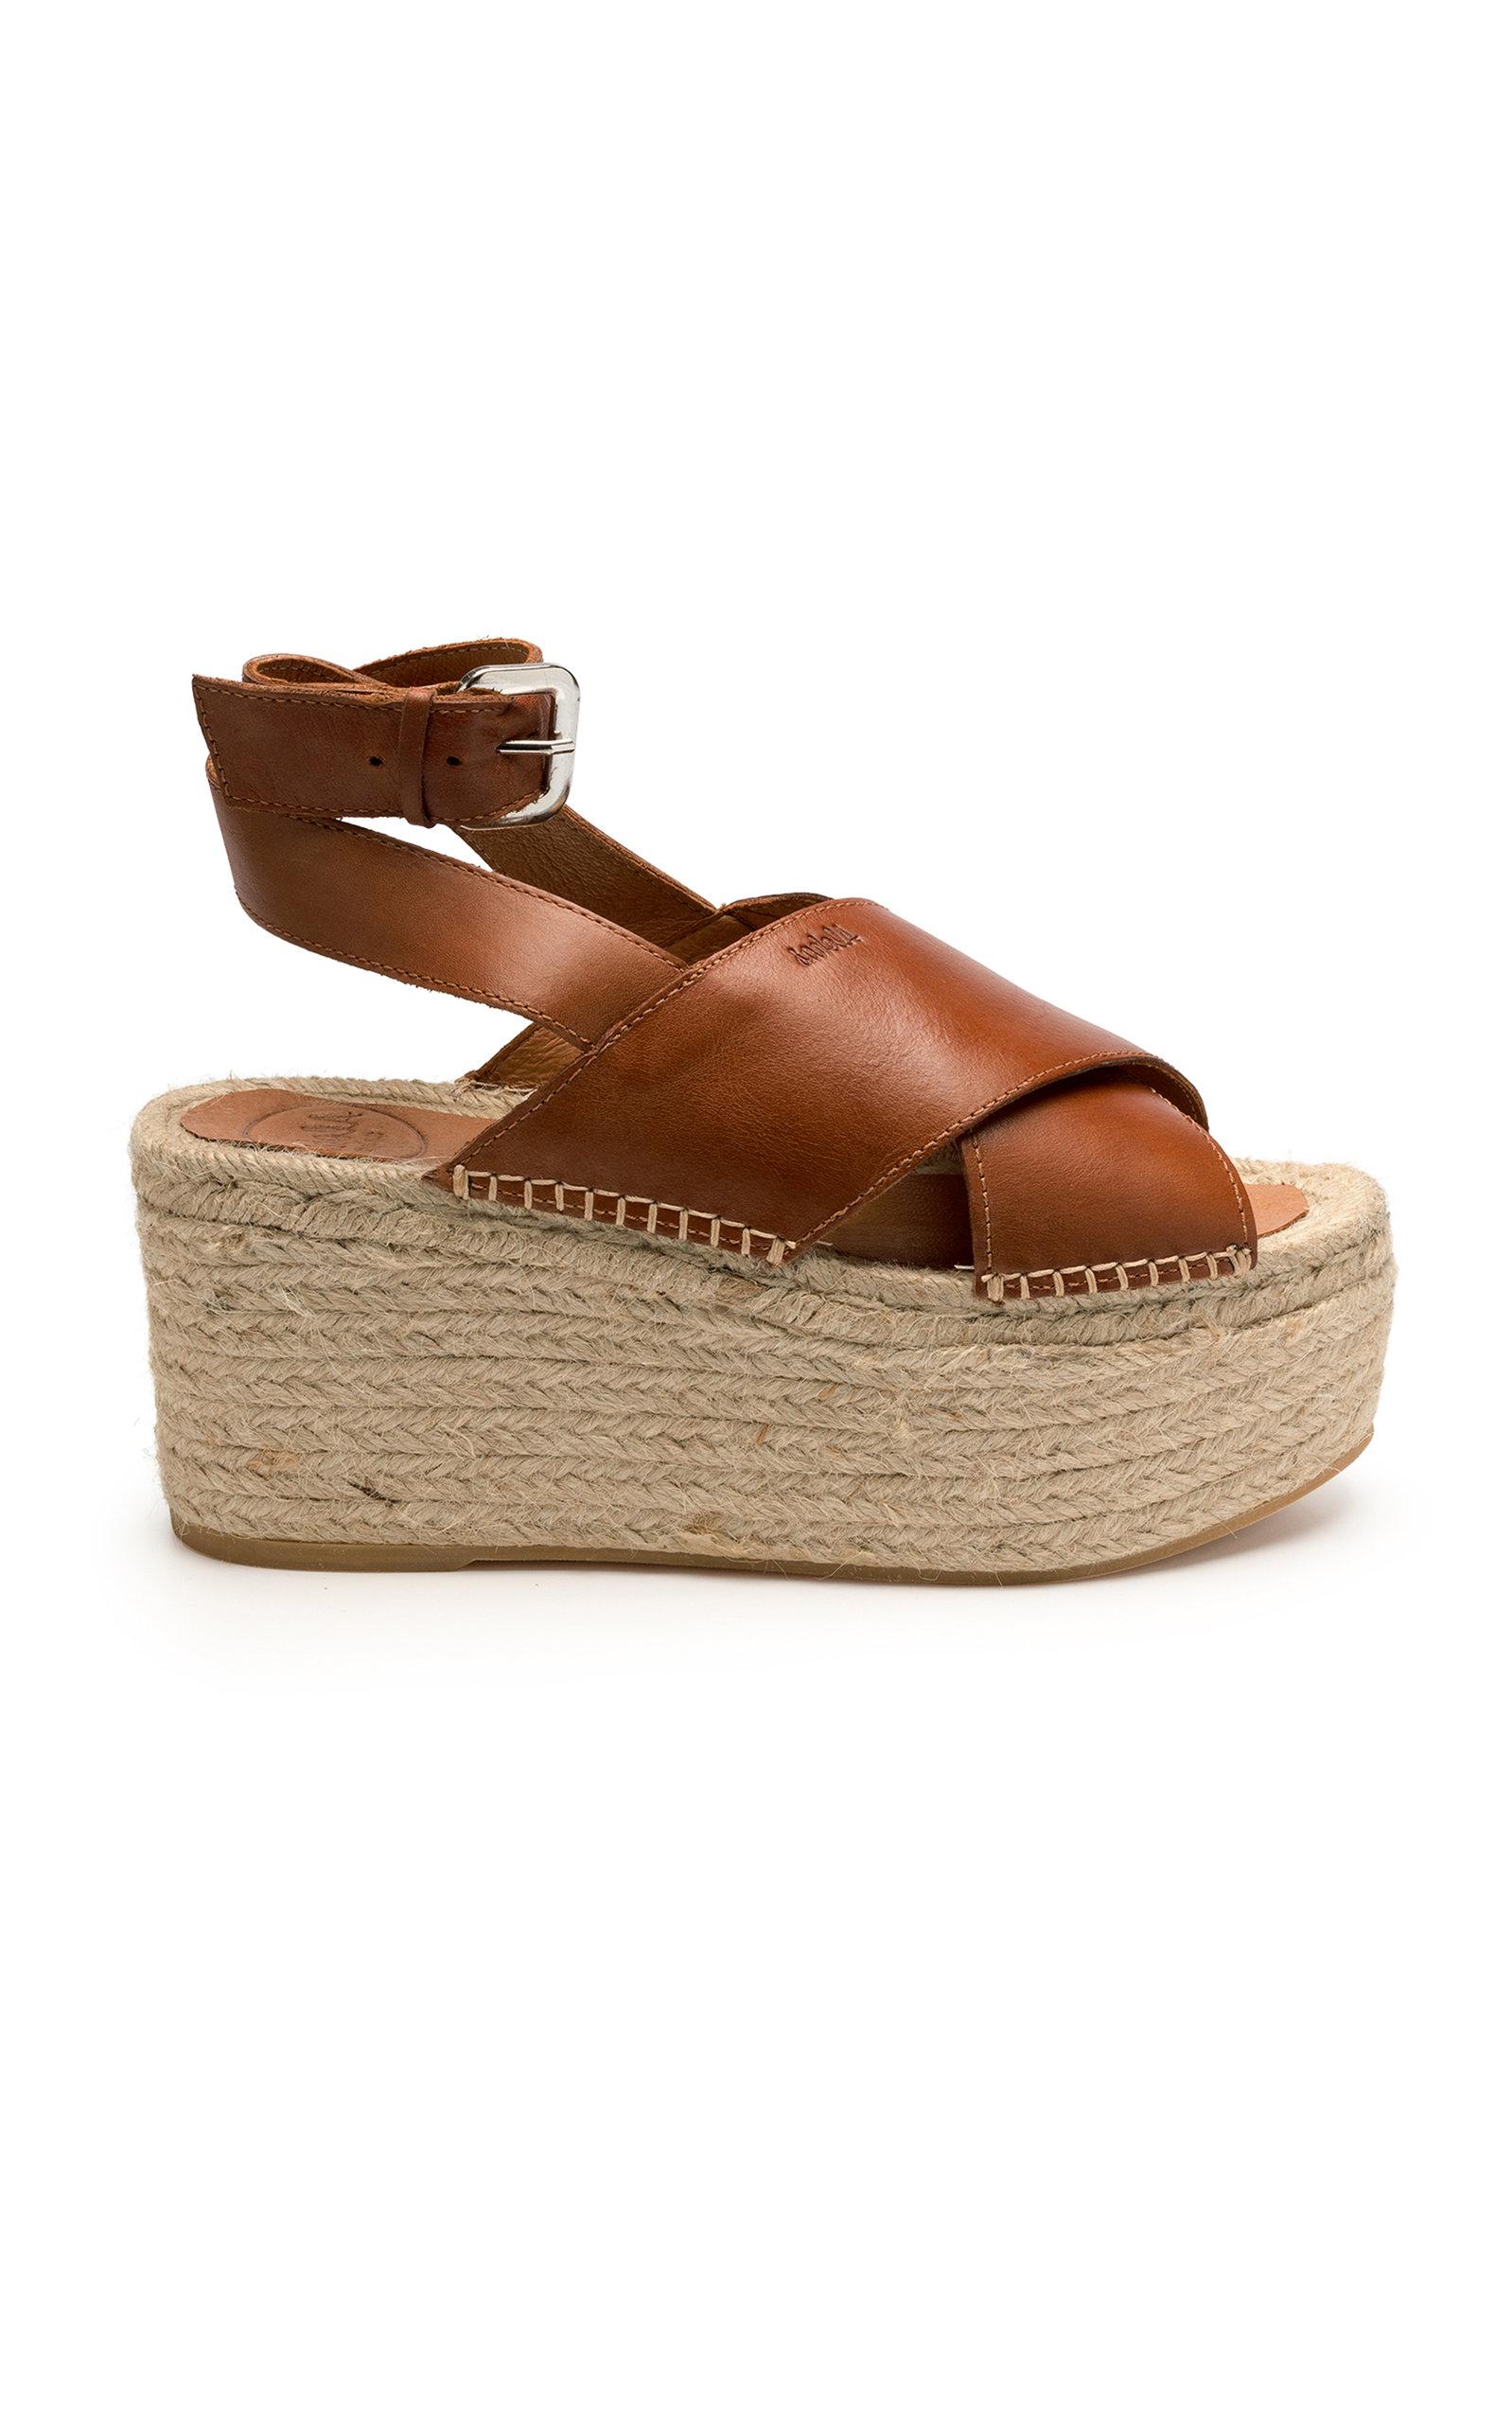 ddcb994d1fd Alohas SandalsVegas Sandal. CLOSE. Loading